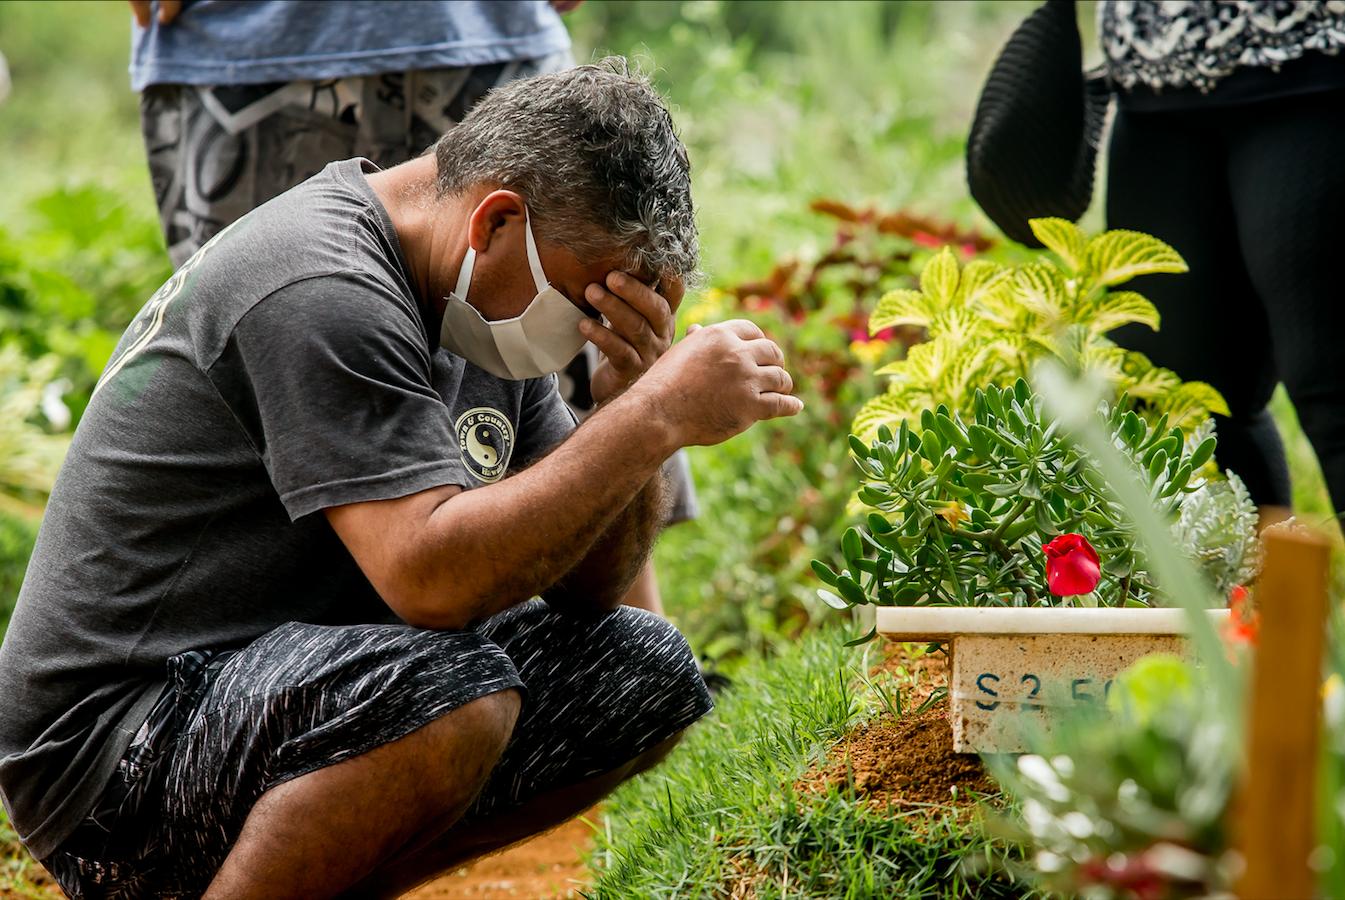 Coronavírus: O luto compartilhado de mais de 160.000 famílias brasileiras  no Dia de Finados | Atualidade | EL PAÍS Brasil